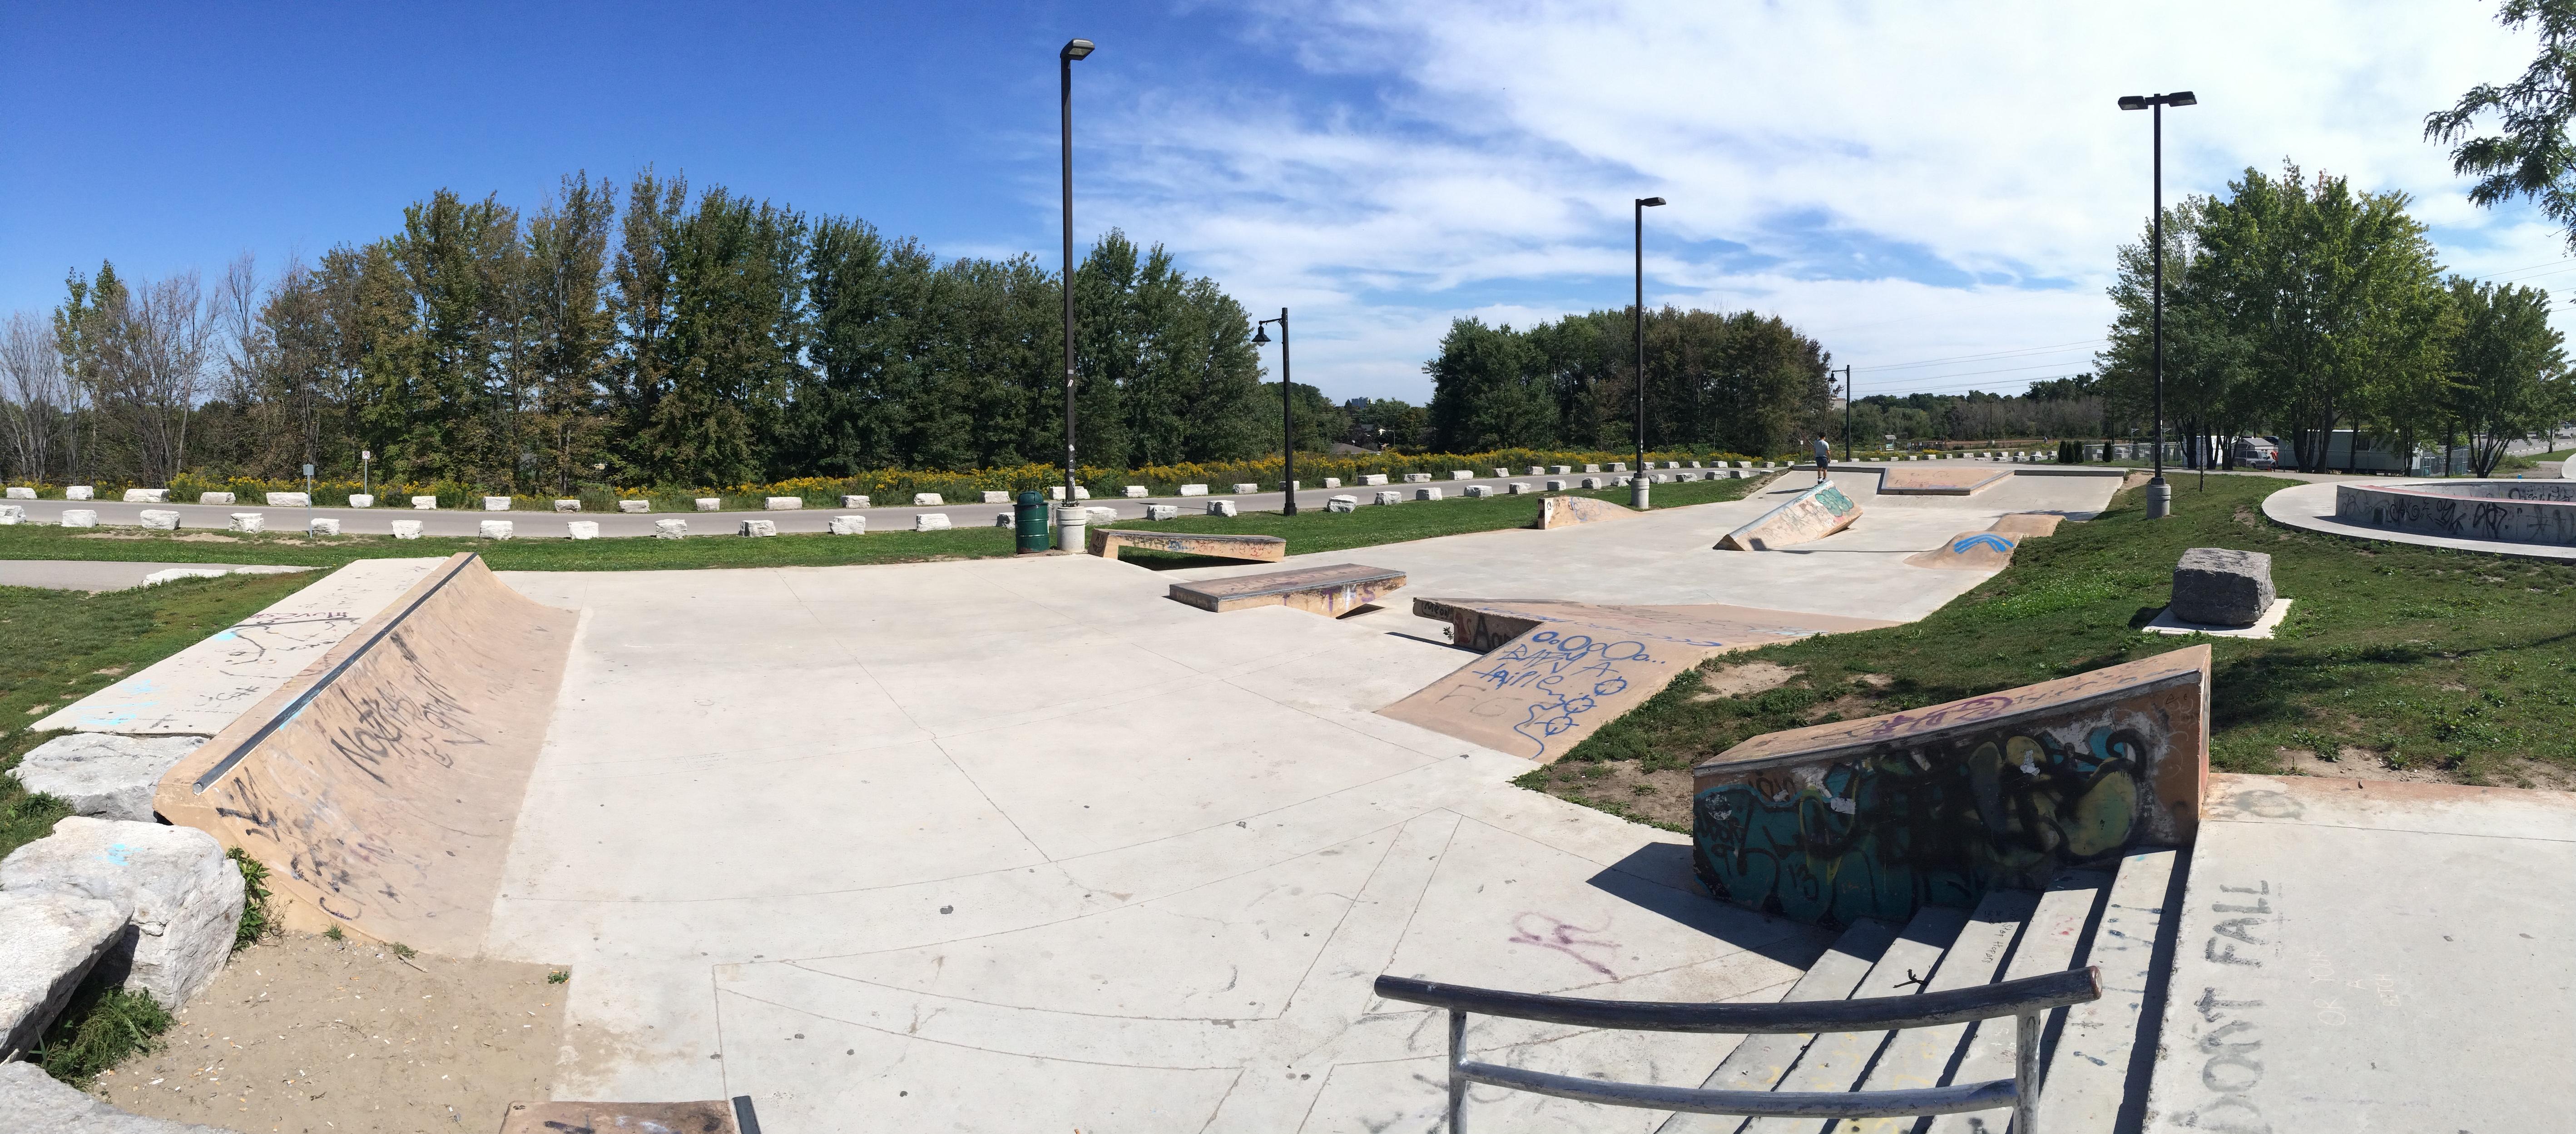 Kitchener McLennan park 1